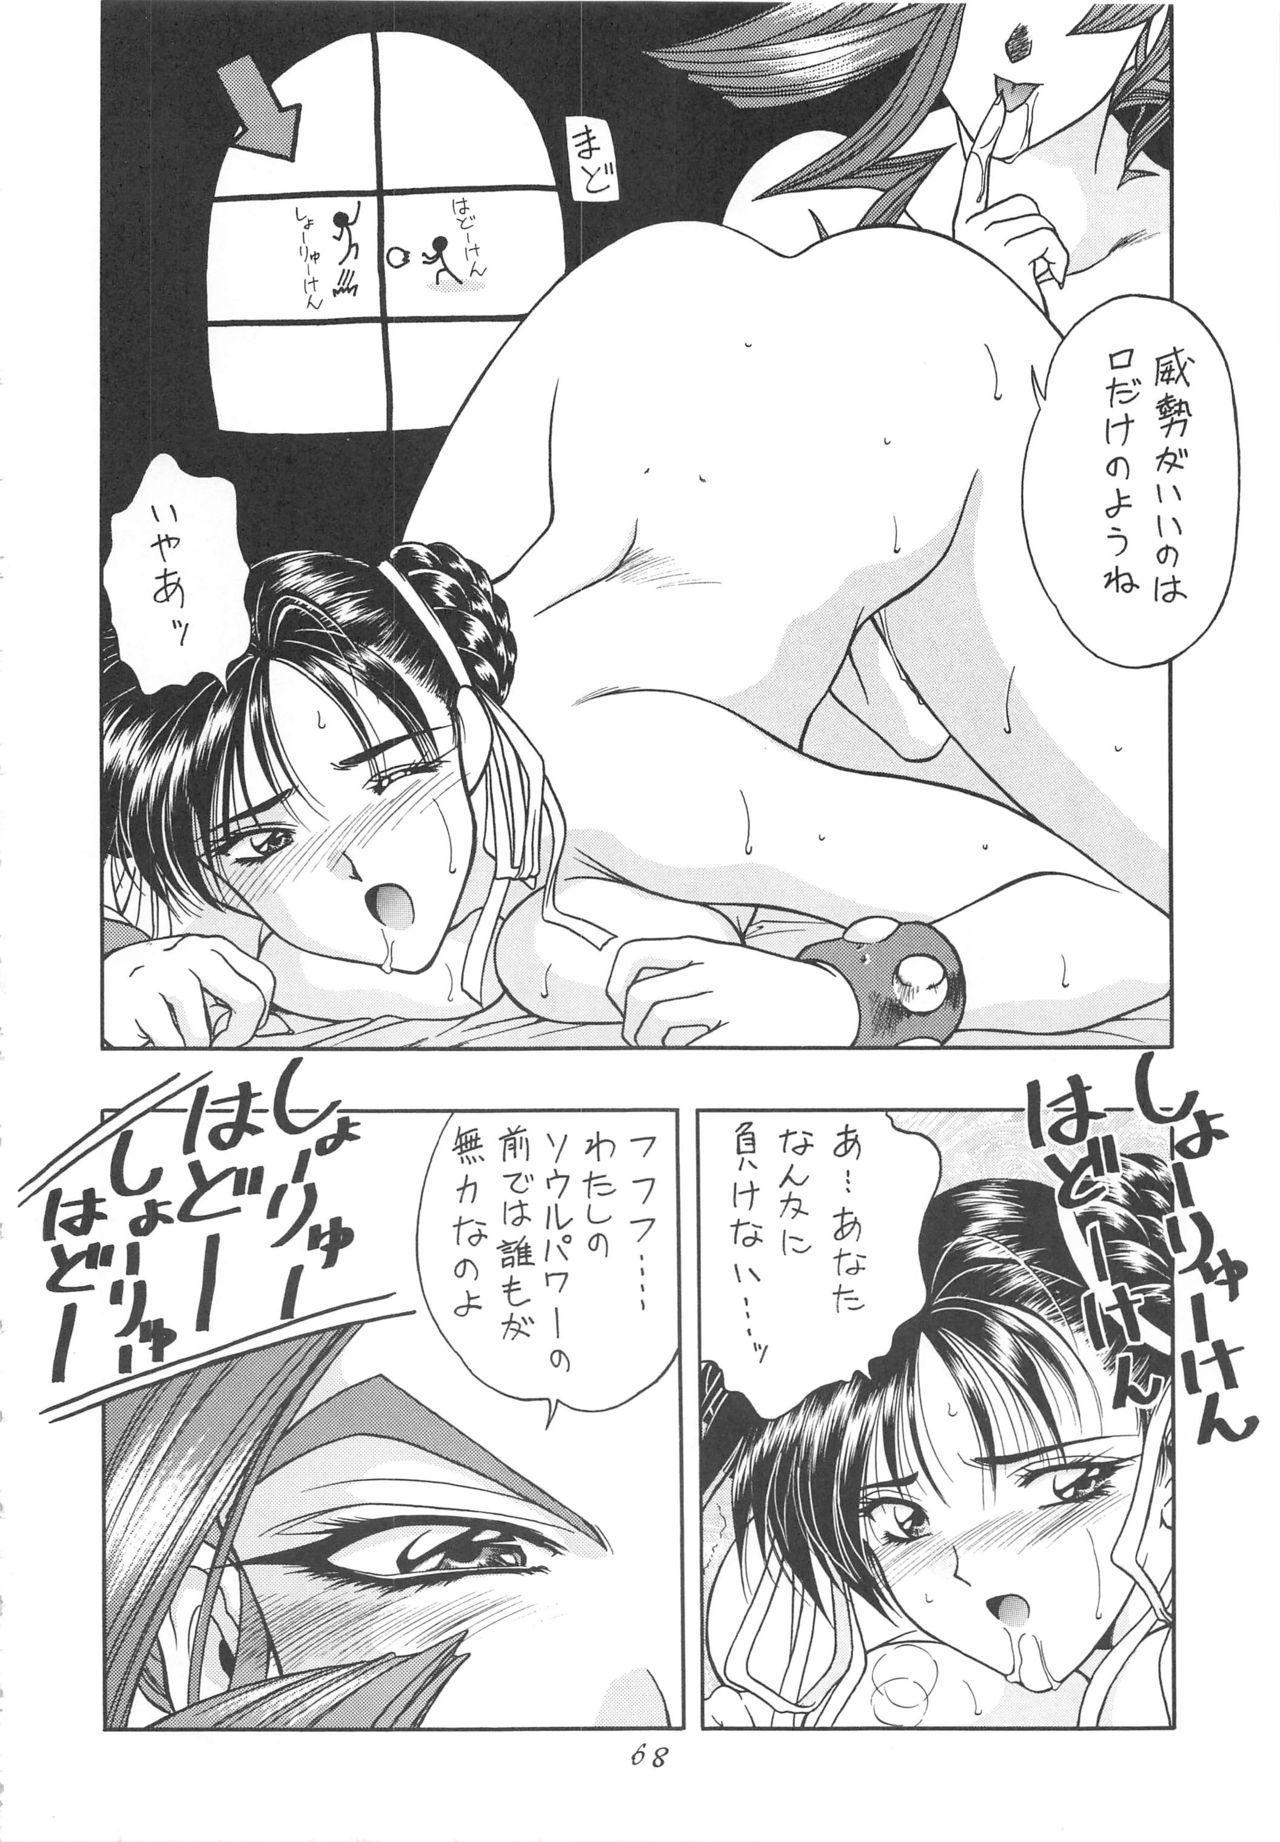 INDIVIDUAL 3 - 19930816 → 67